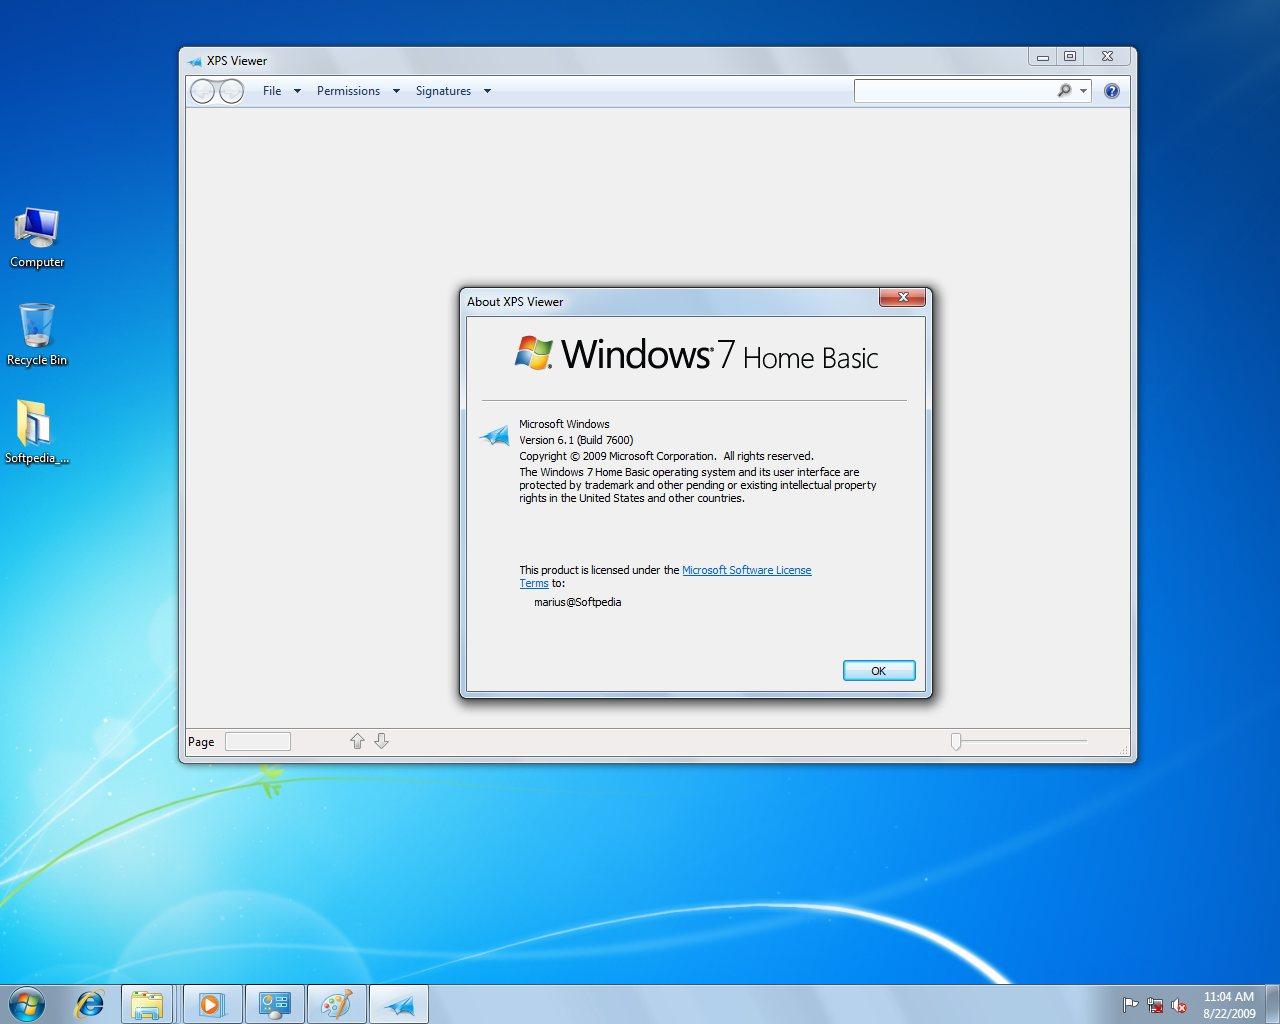 Windows 7 RTM Home Basic 110-Screenshot Gallery